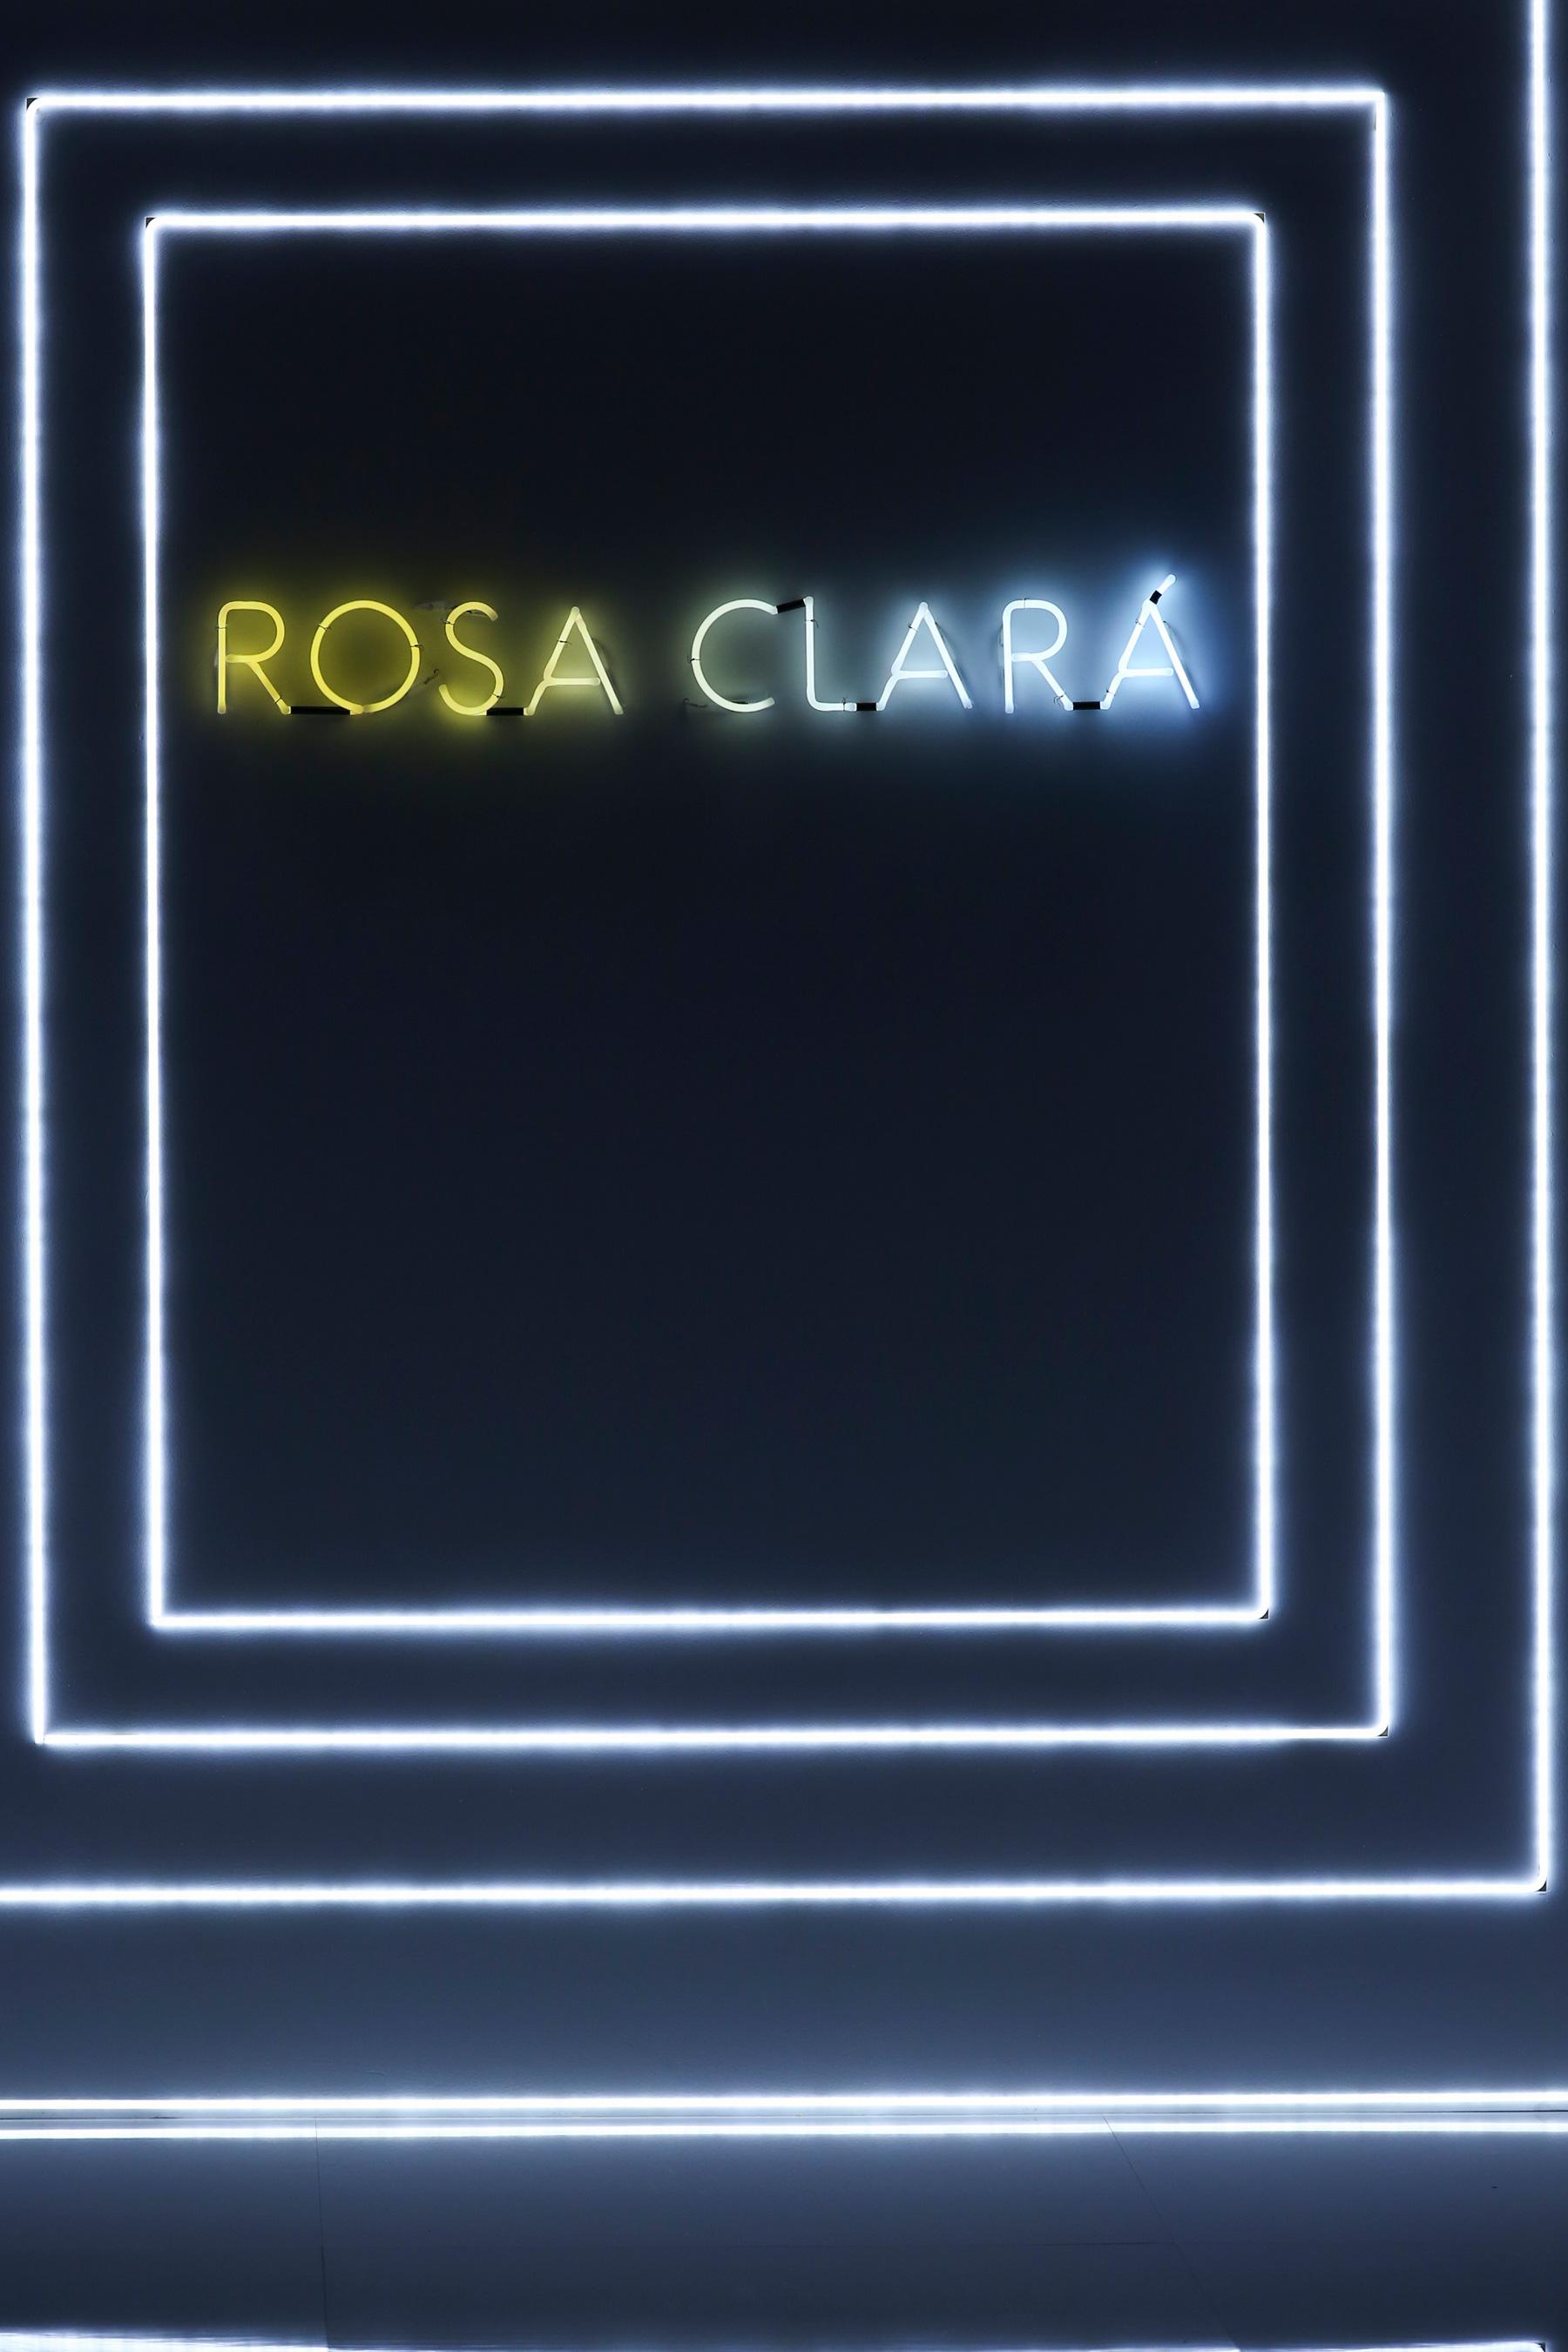 Rosa Clara brd RS17 0346